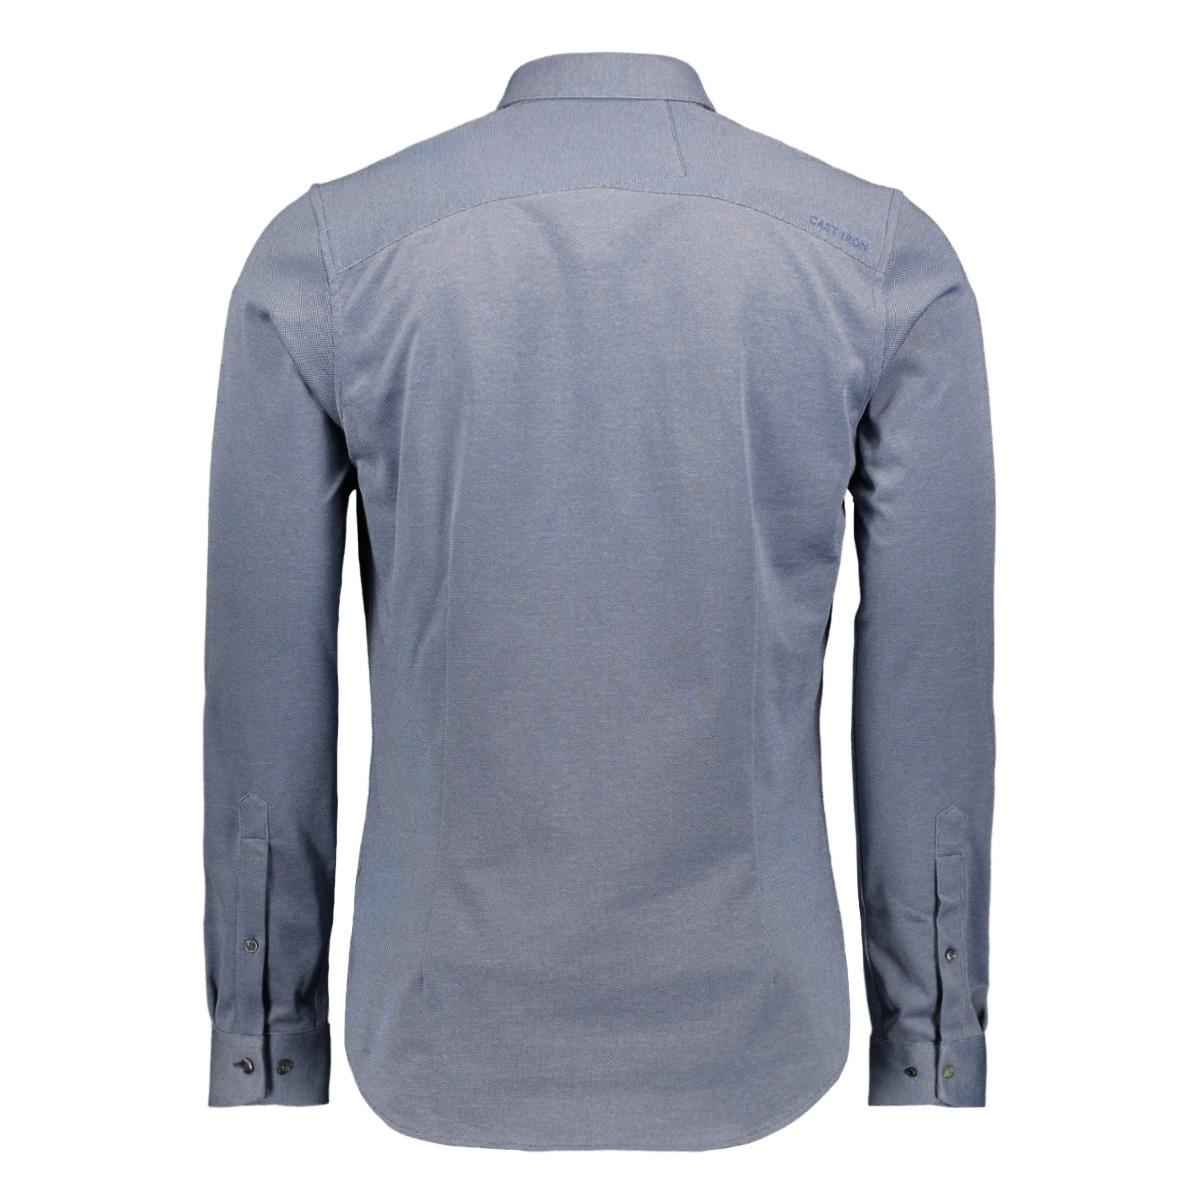 jersey pique oxford csi202621 cast iron overhemd 5054